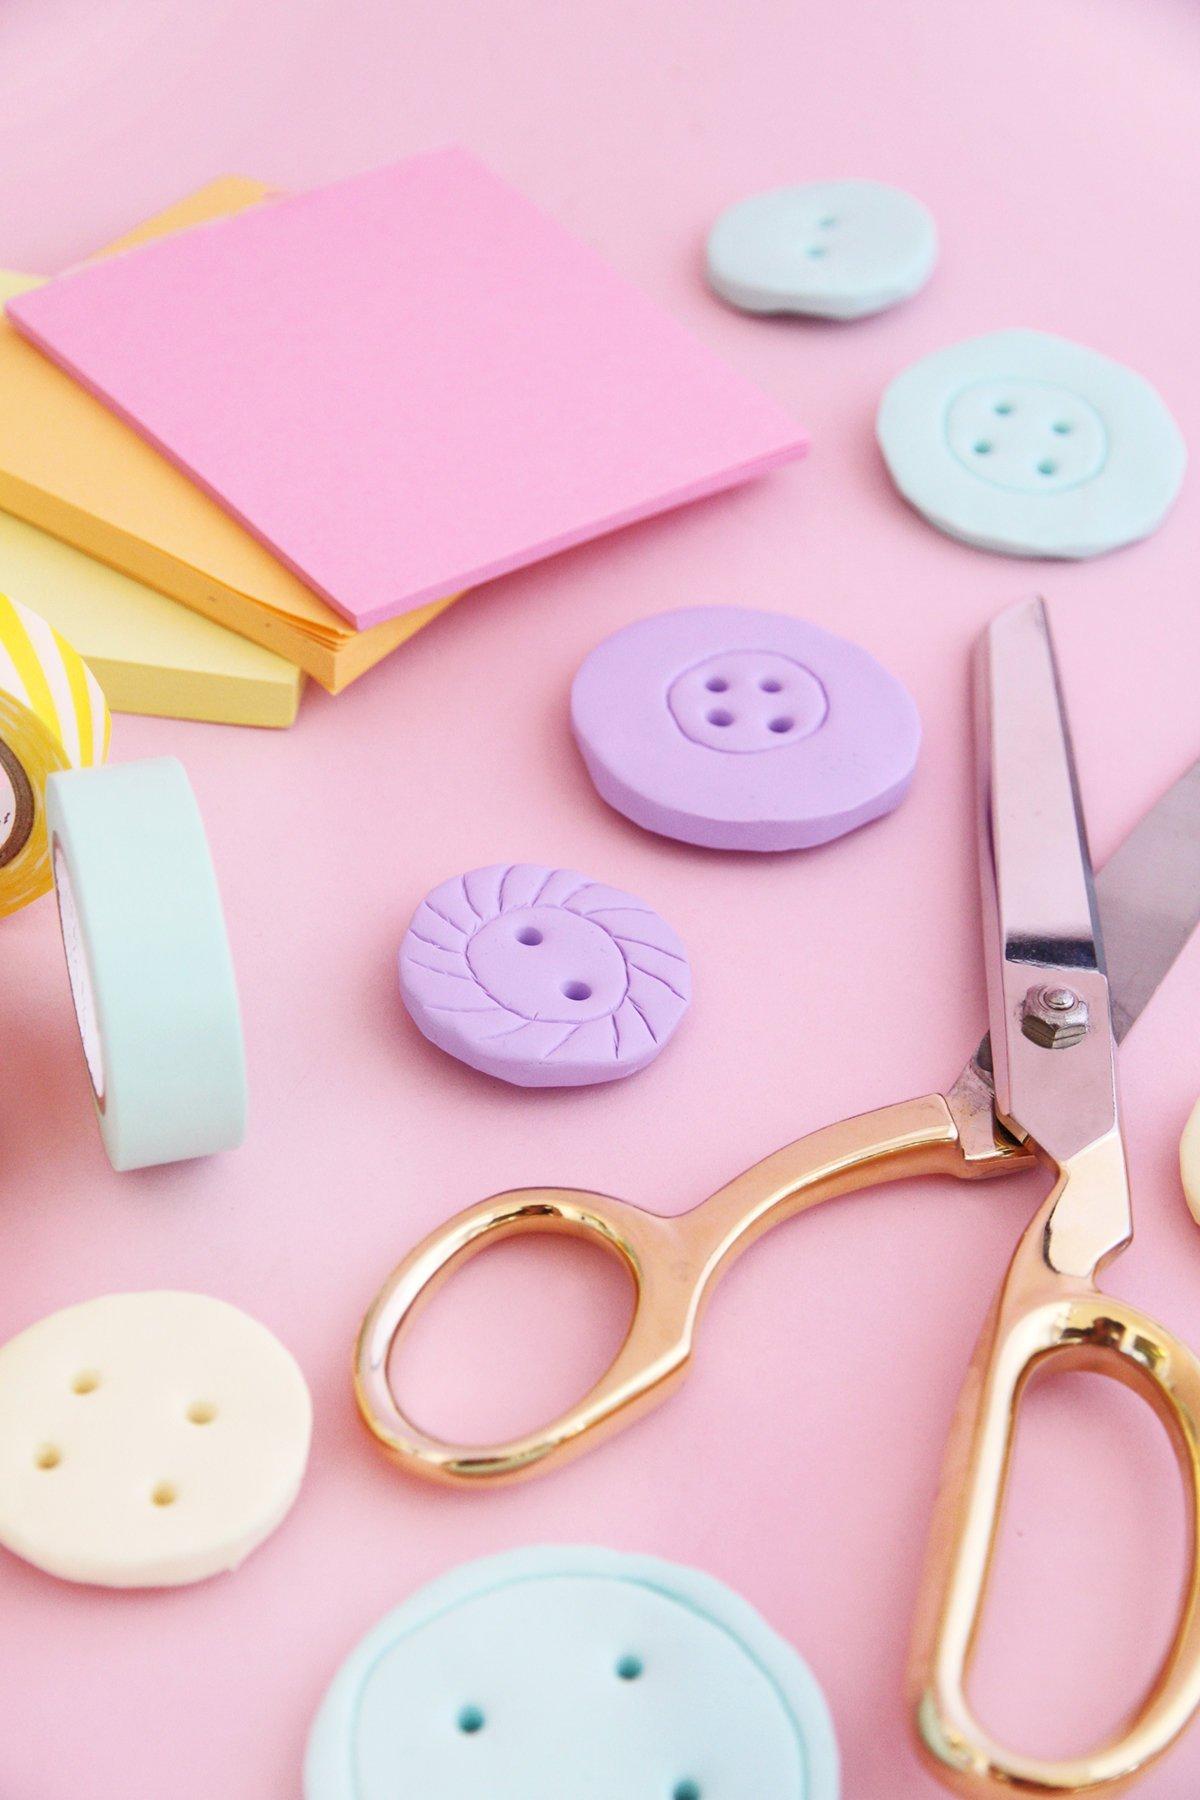 Makerist-Basteln-mit-Kindern-50-DIY-Projekte-Magnete-in-Knopf-Form